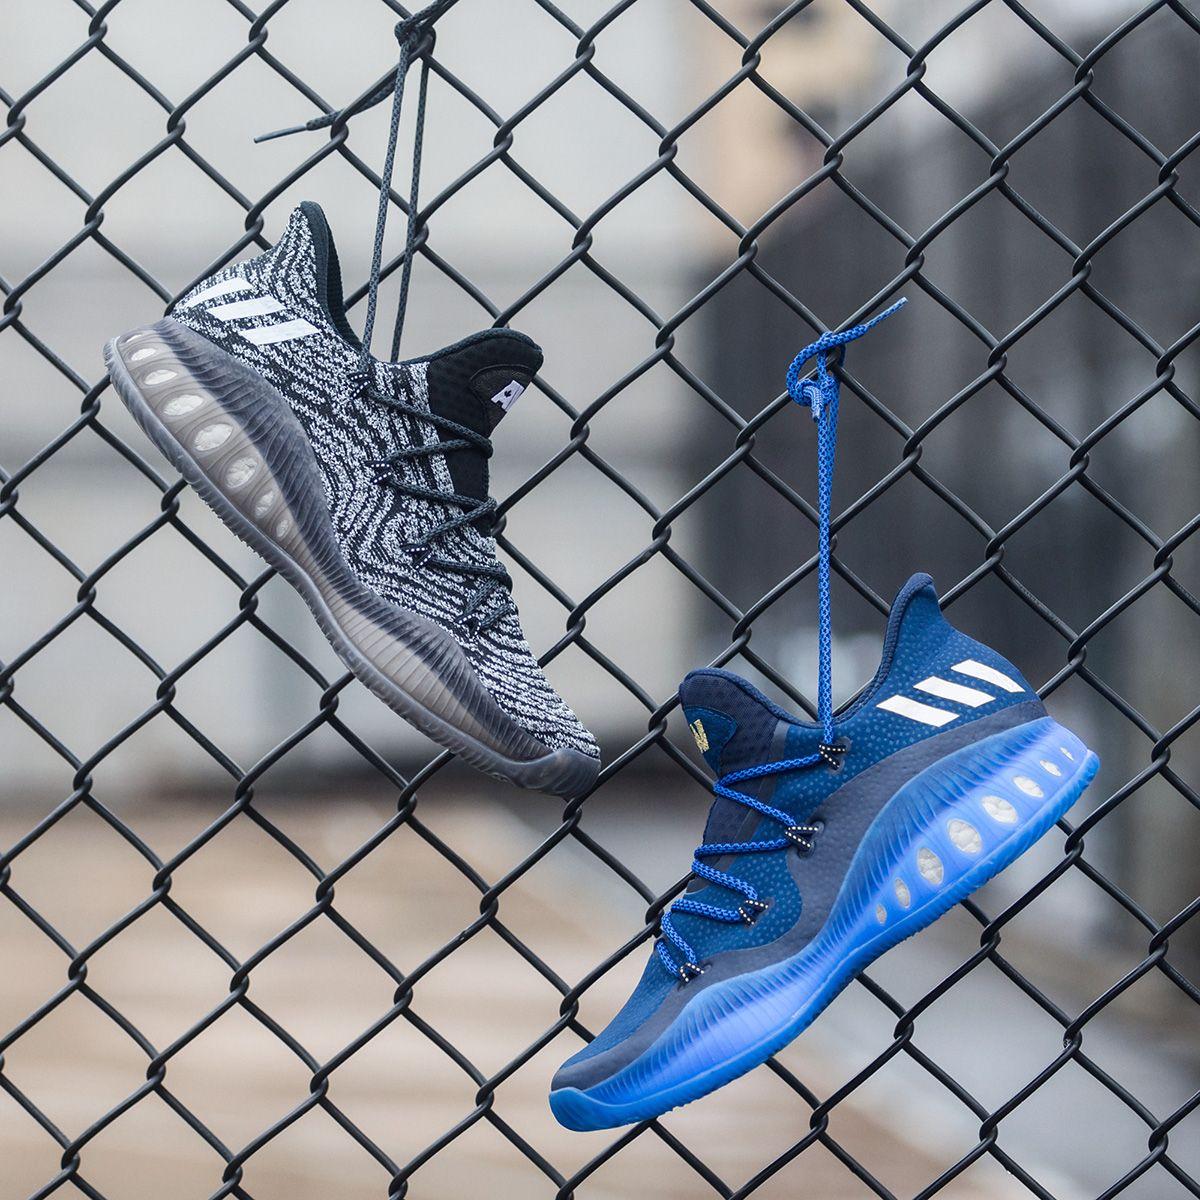 b3acb7dda6a2 Two adidas Crazy Explosive Low PE for Andrew Wiggins - EU Kicks  Sneaker  Magazine